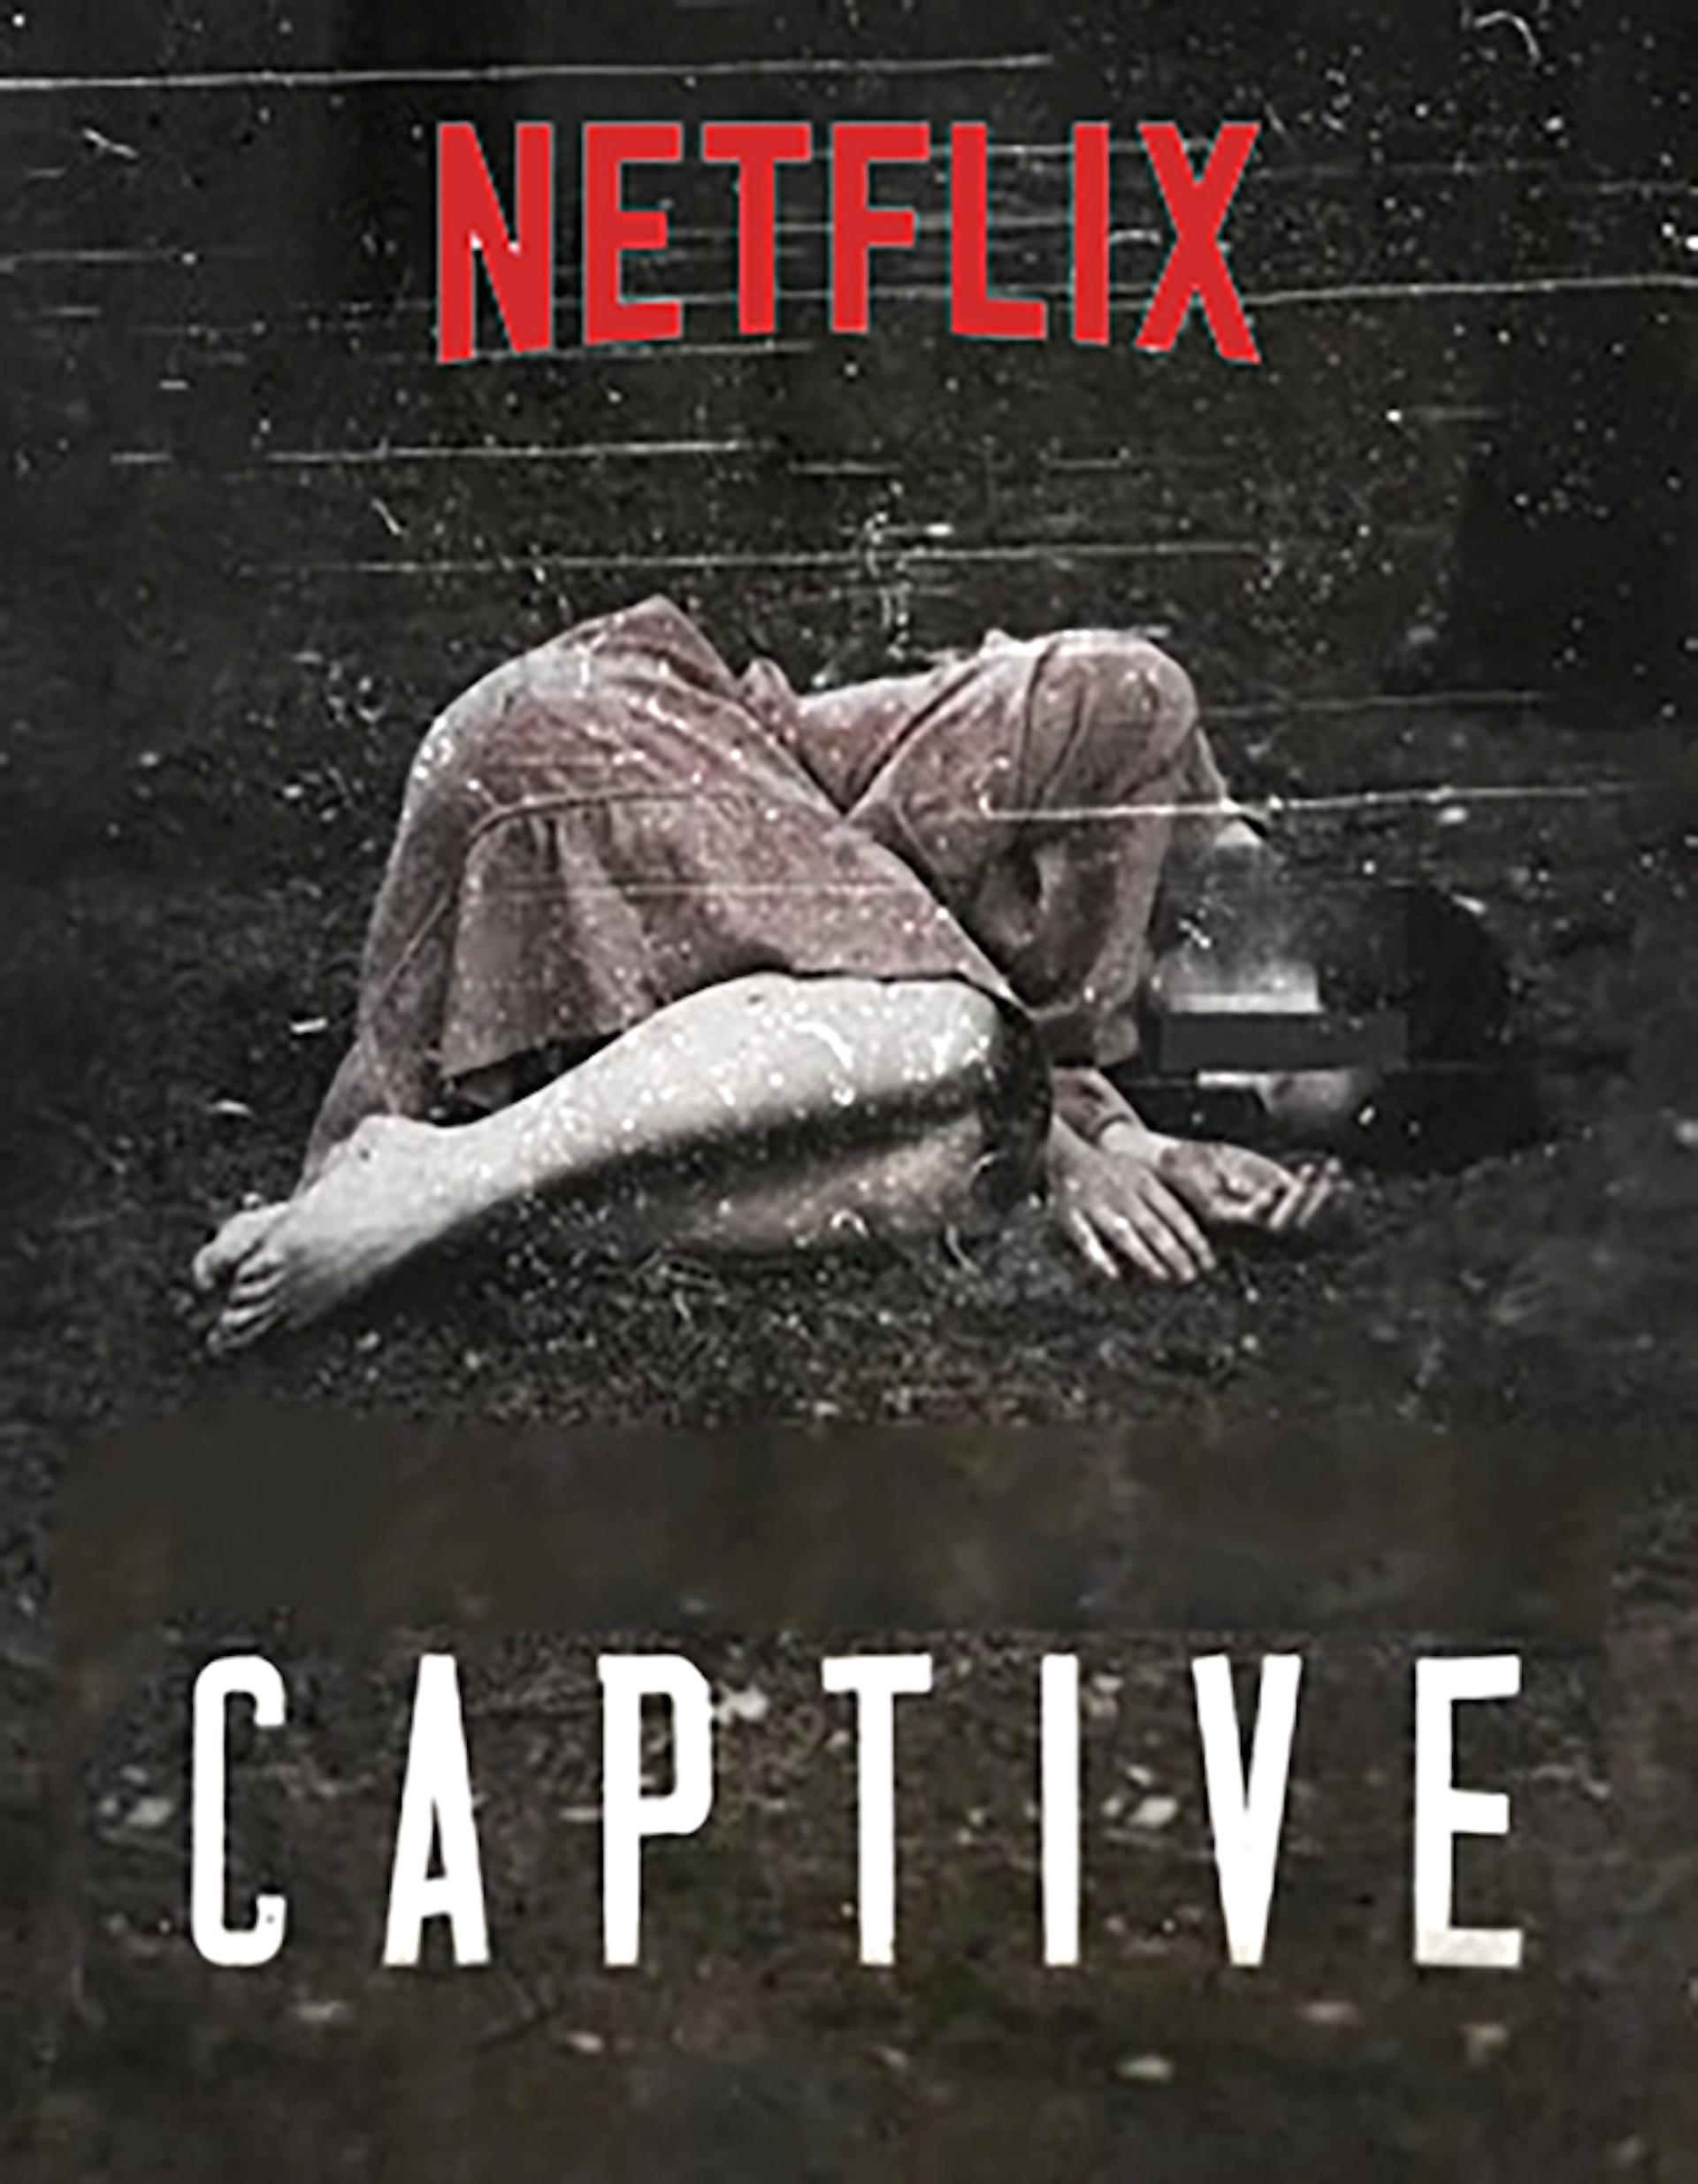 Captive/NETFLIX